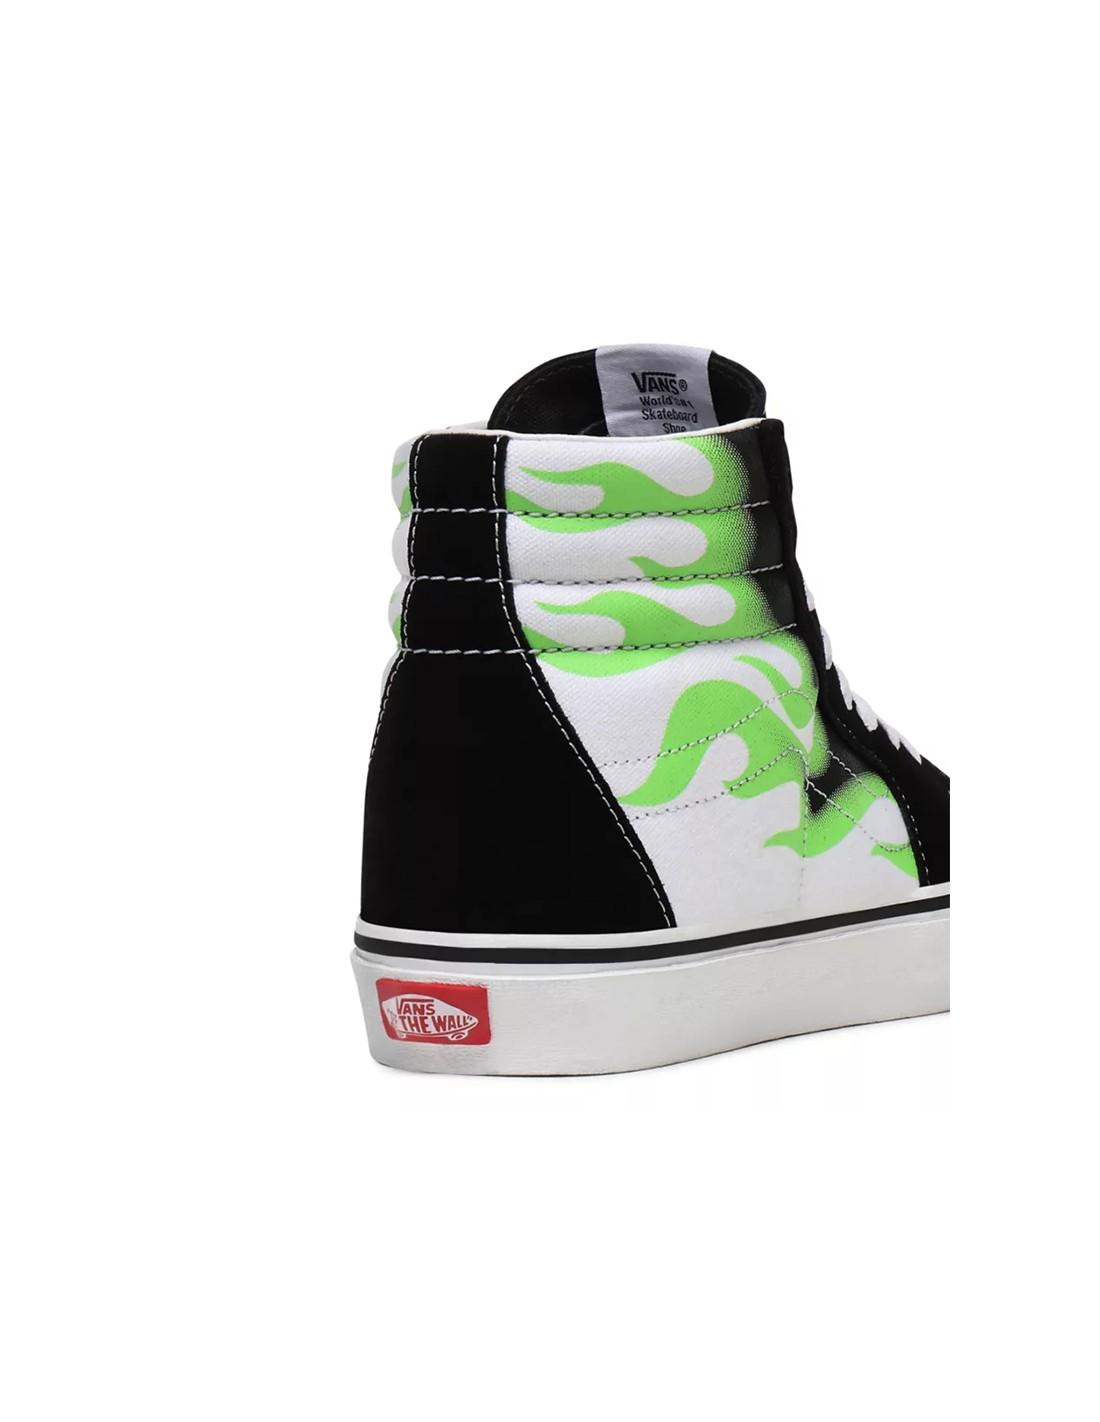 Nuove scarpe Vans Flame SK8 HI disponibile sul nostro shop